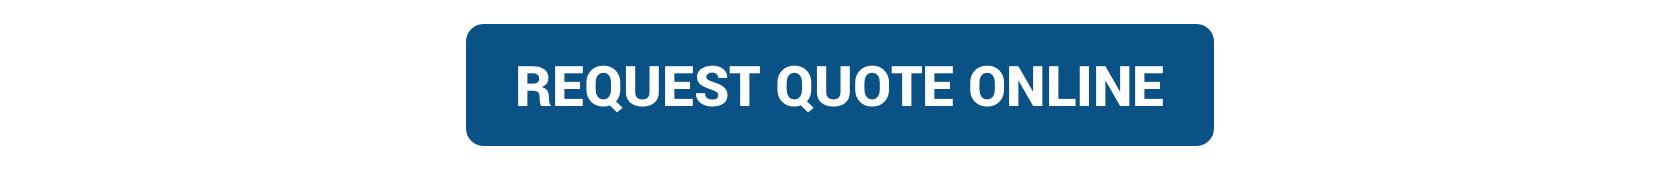 Request Quote Online Link